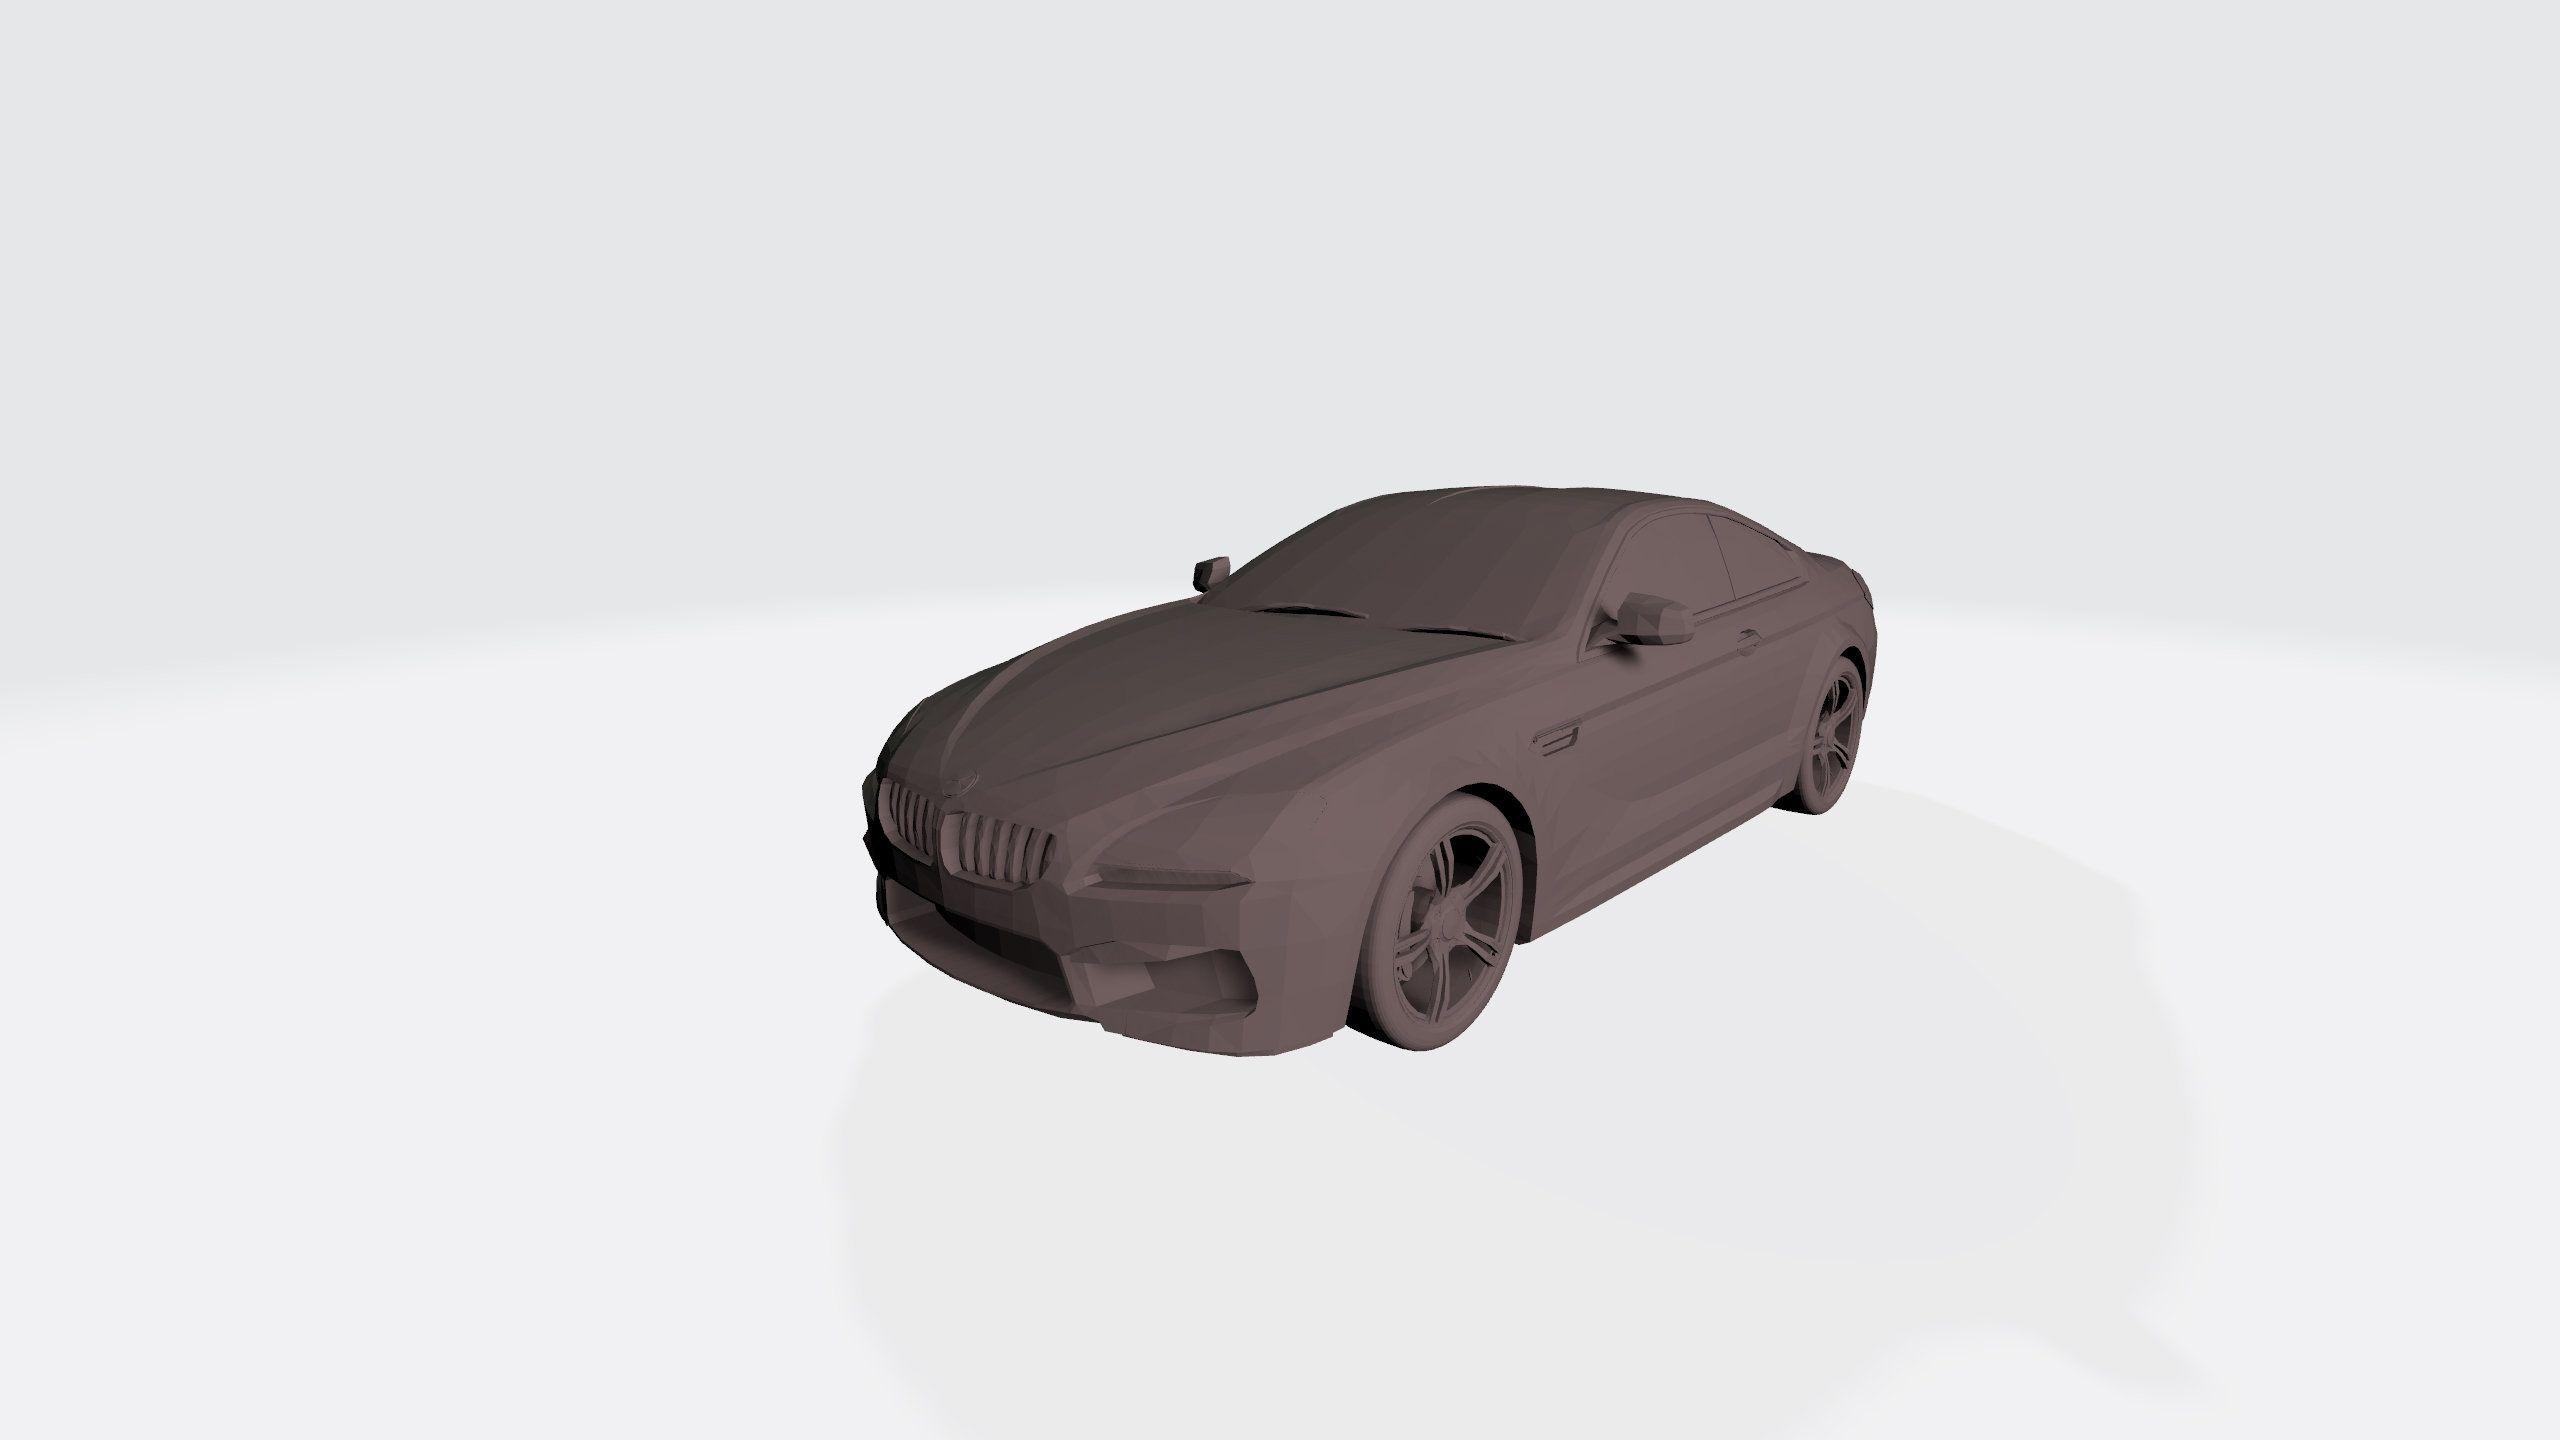 Bmw M6 3d Model 3d Cars For Printing 3d Model Car 3d Printing Model Stl File For 3d Printers 3d Cars Bmw M6 Bmw 3d Model